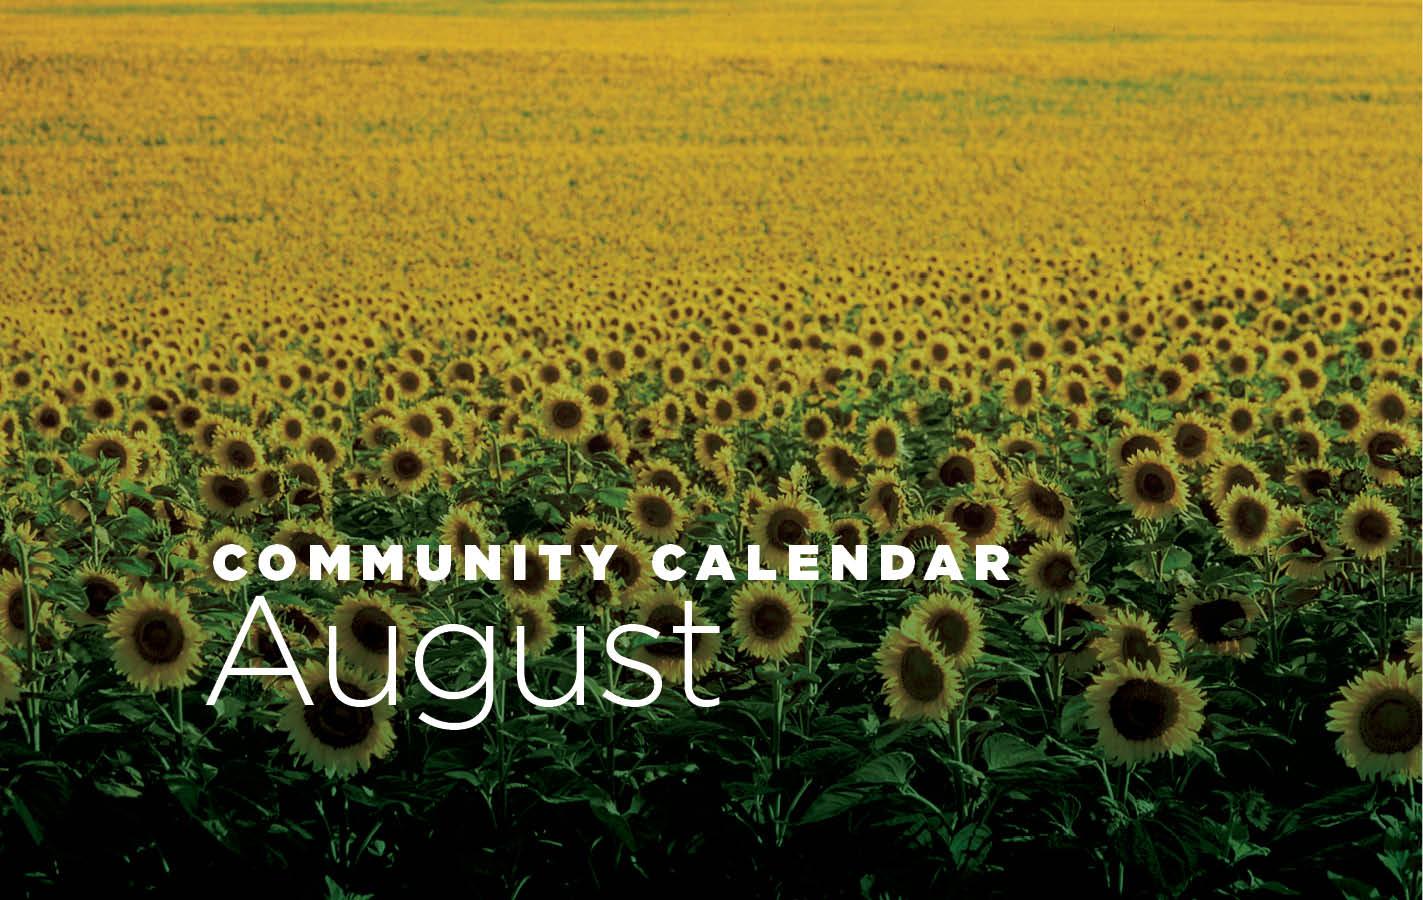 Community Calendar for August 2019